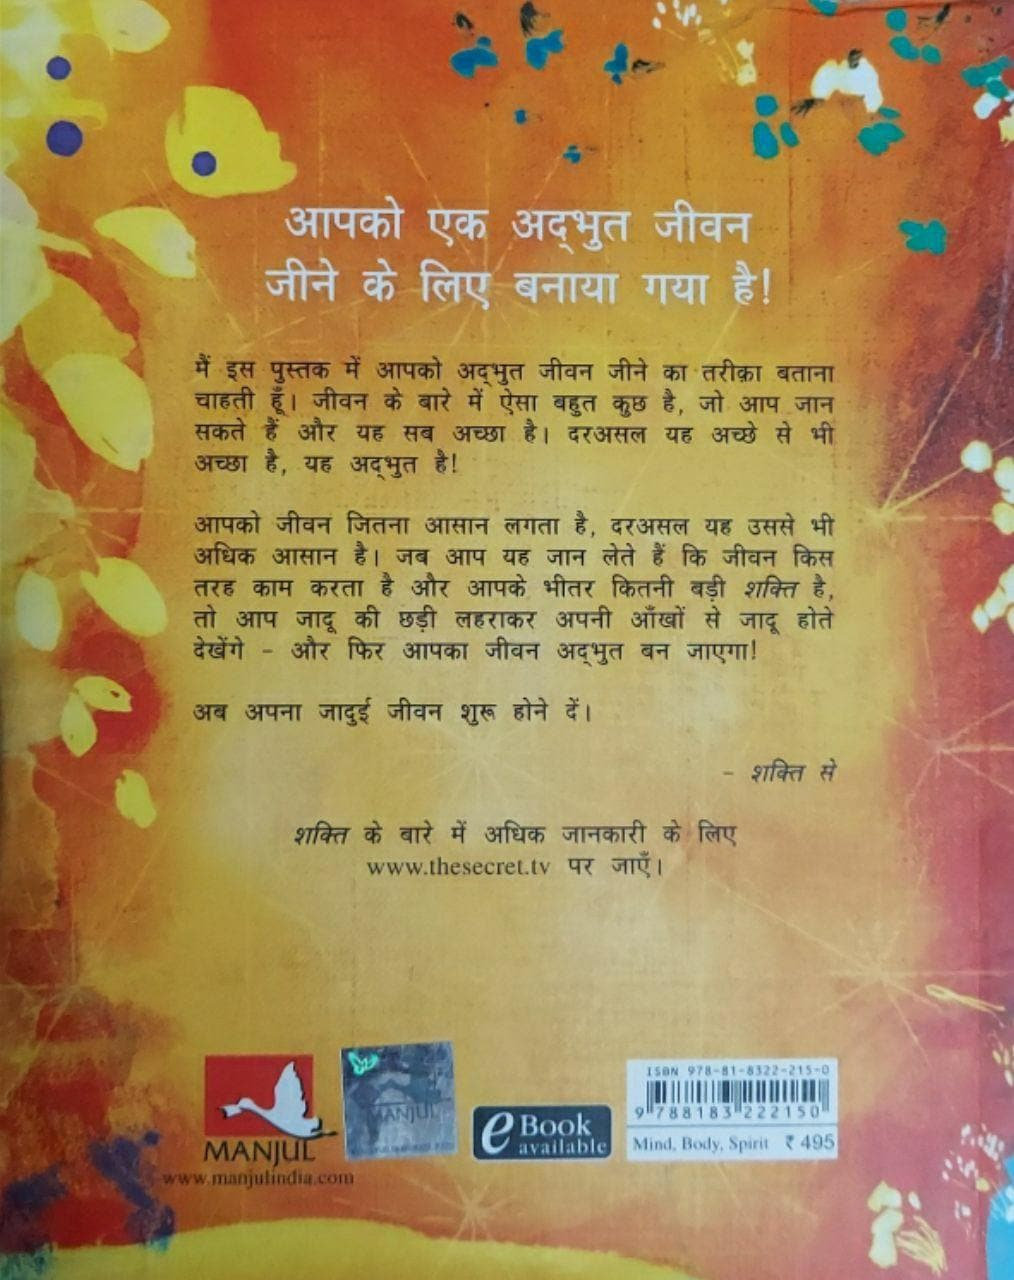 The Secret Shakti (HINDI EDITION), Rhonda Byrne MANJUL PUBLICATION, PAPER BACK